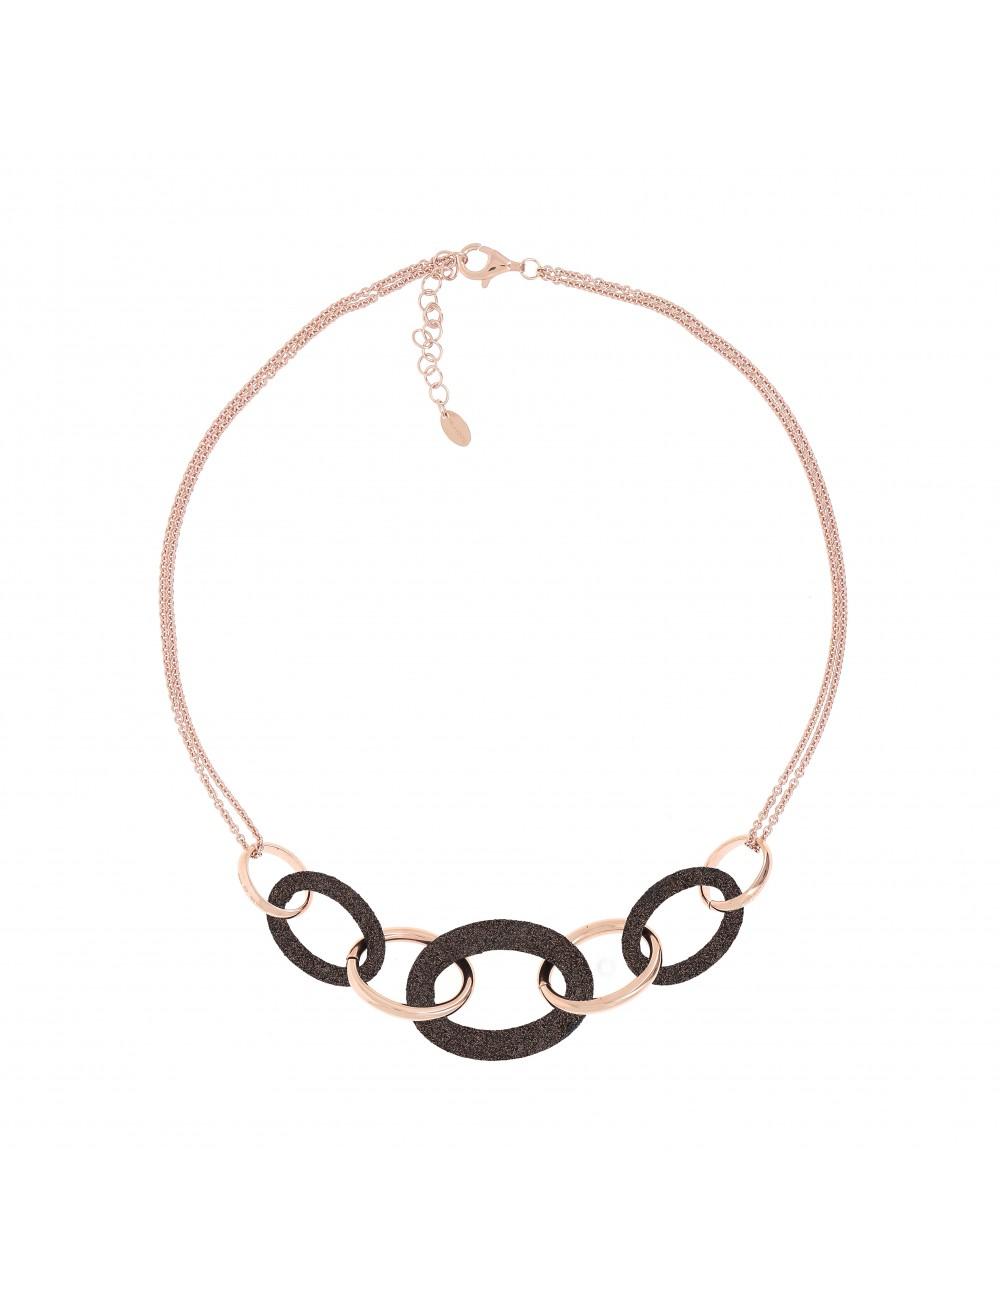 Pesavento -Collar Pesavento plata baño oro rosa -WPLVE1160